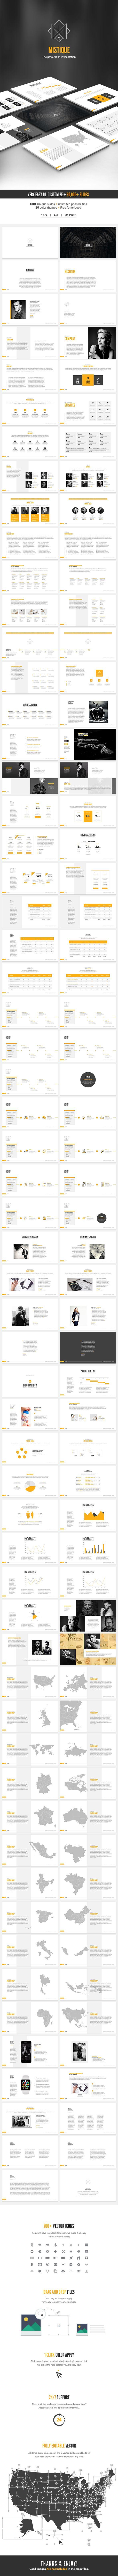 Mistique Powerpoint Template — Powerpoint PPTX #tech #infographics • Download ➝ https://graphicriver.net/item/mistique-powerpoint-template/18928113?ref=pxcr